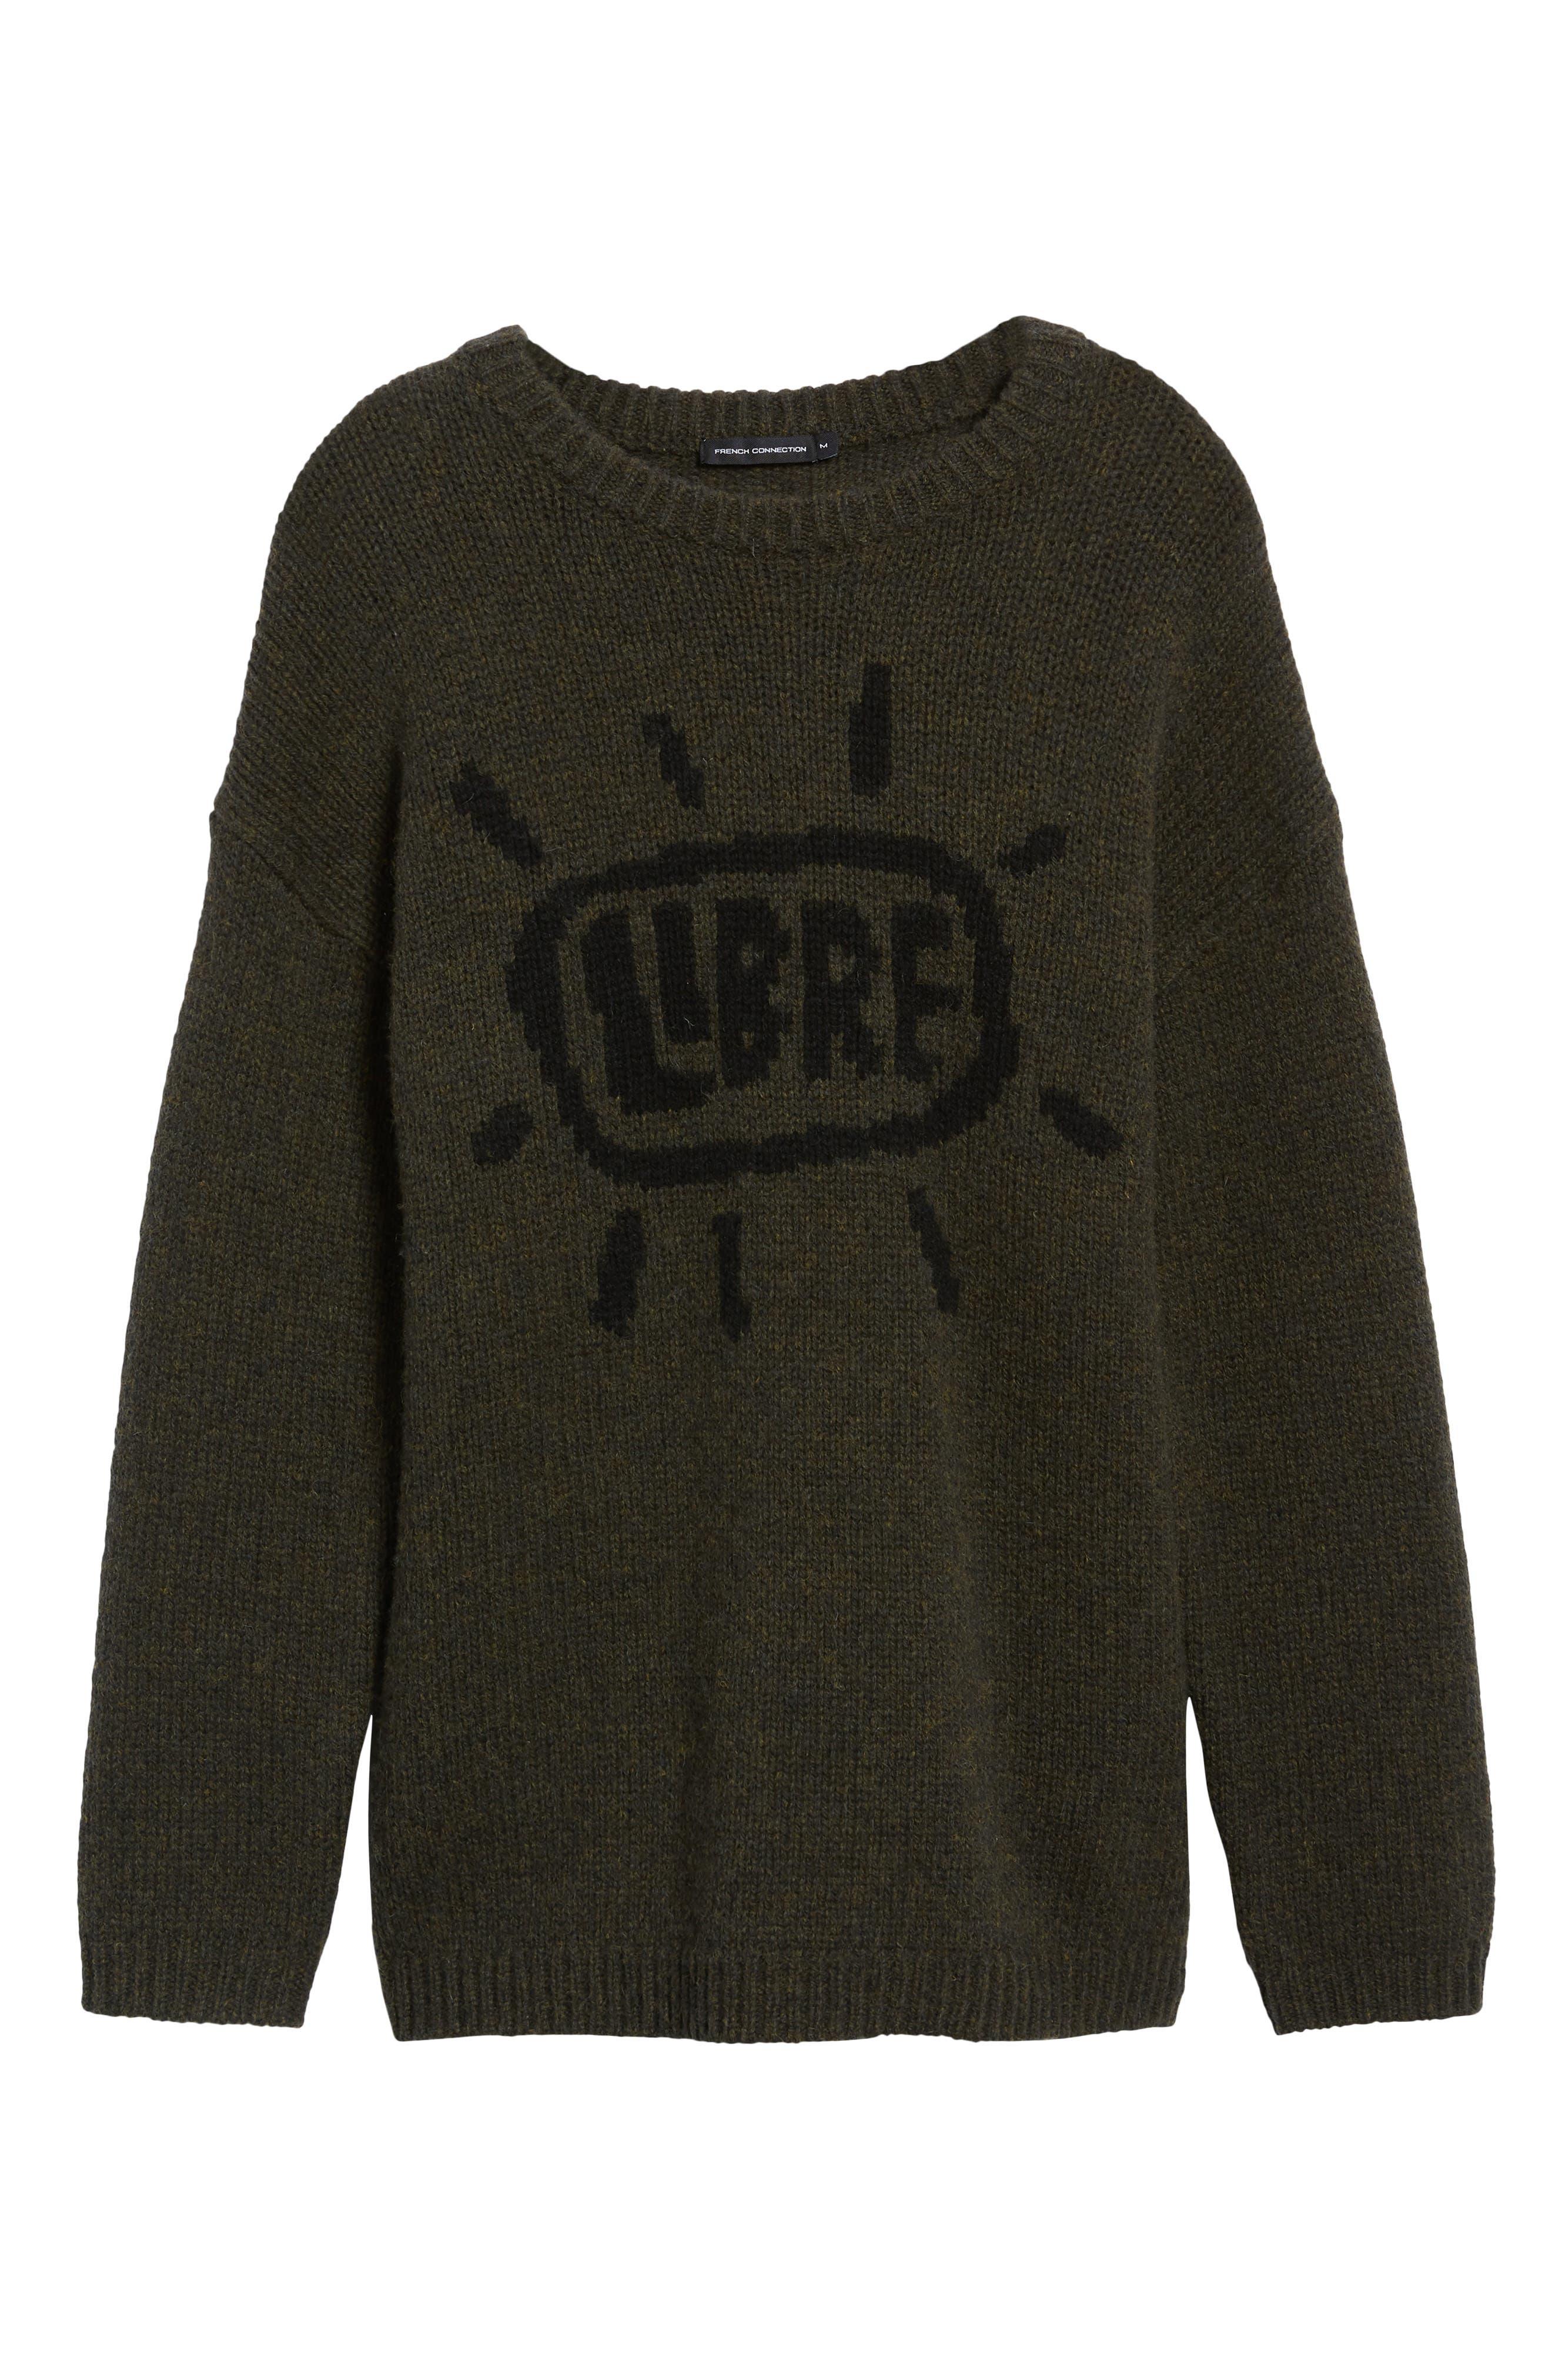 Free Regular Fit Shetland Wool Sweater,                             Alternate thumbnail 6, color,                             MIDNIGHT MOSS BLACK